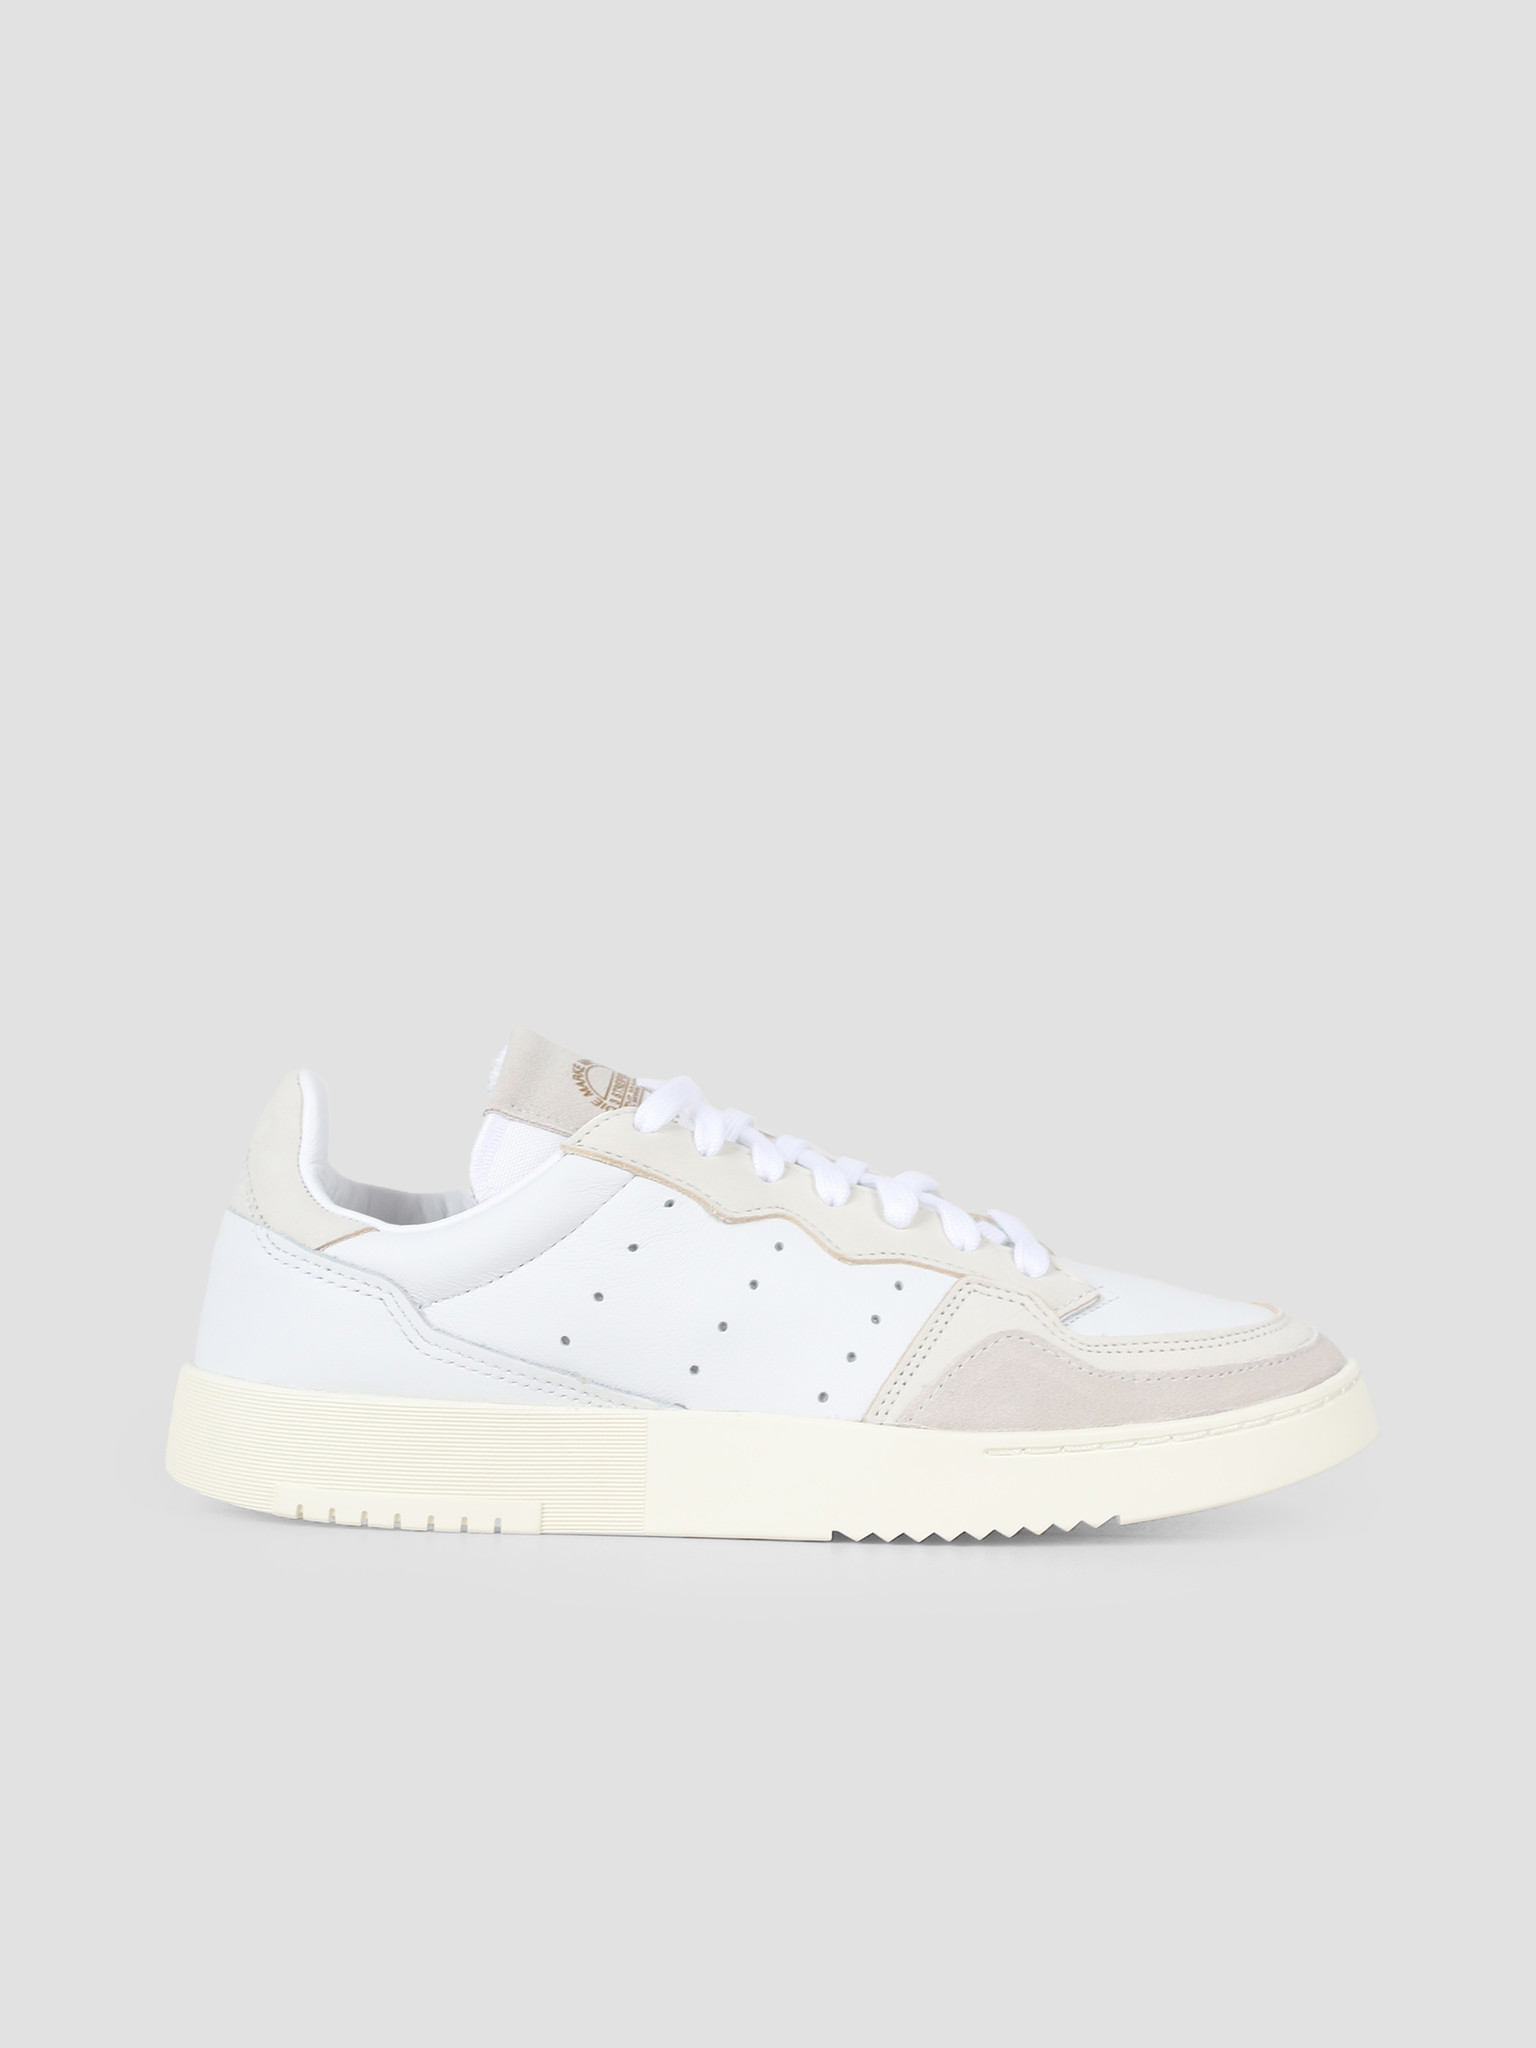 adidas adidas Supercourt Crywht Cwhite Owhite EE6024